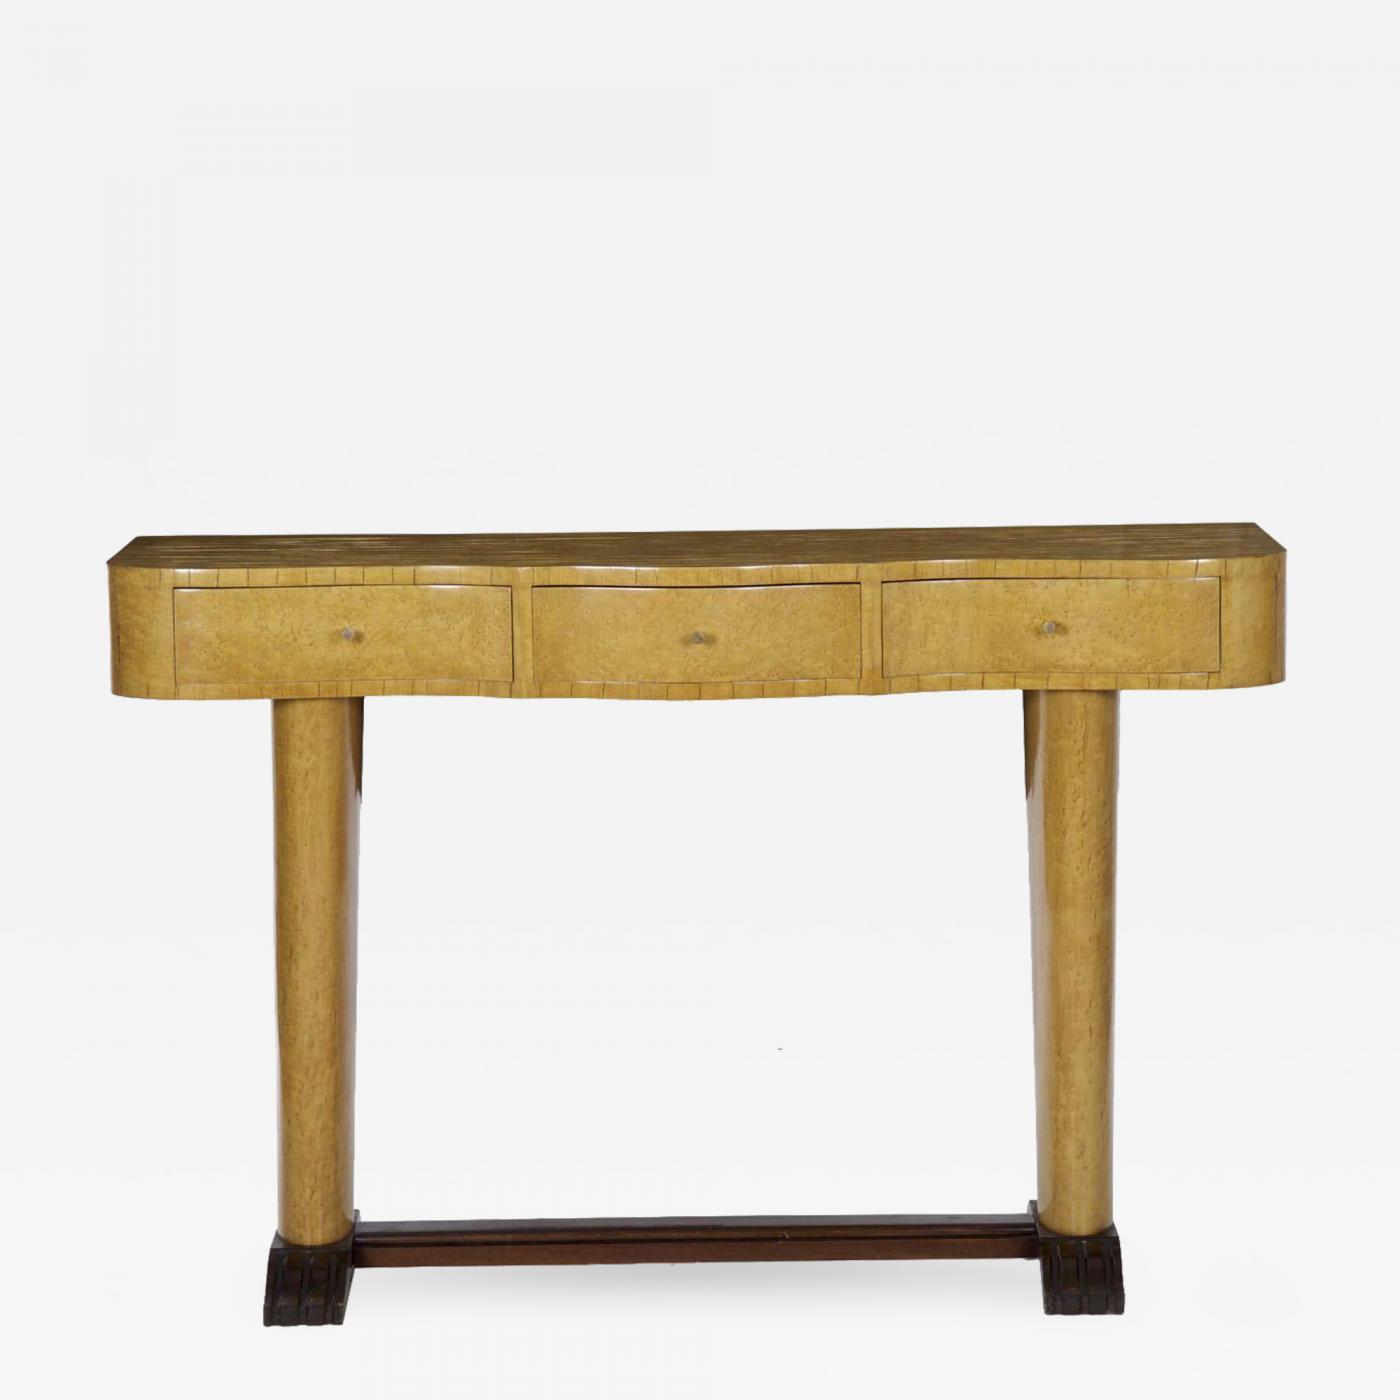 Art deco period furniture Historical Listings Furniture Tables Console Pier Tables Art Deco Period Jeanmarc Fray Art Deco Period Birdseye Maple Threedrawer Console Brazil C 1940